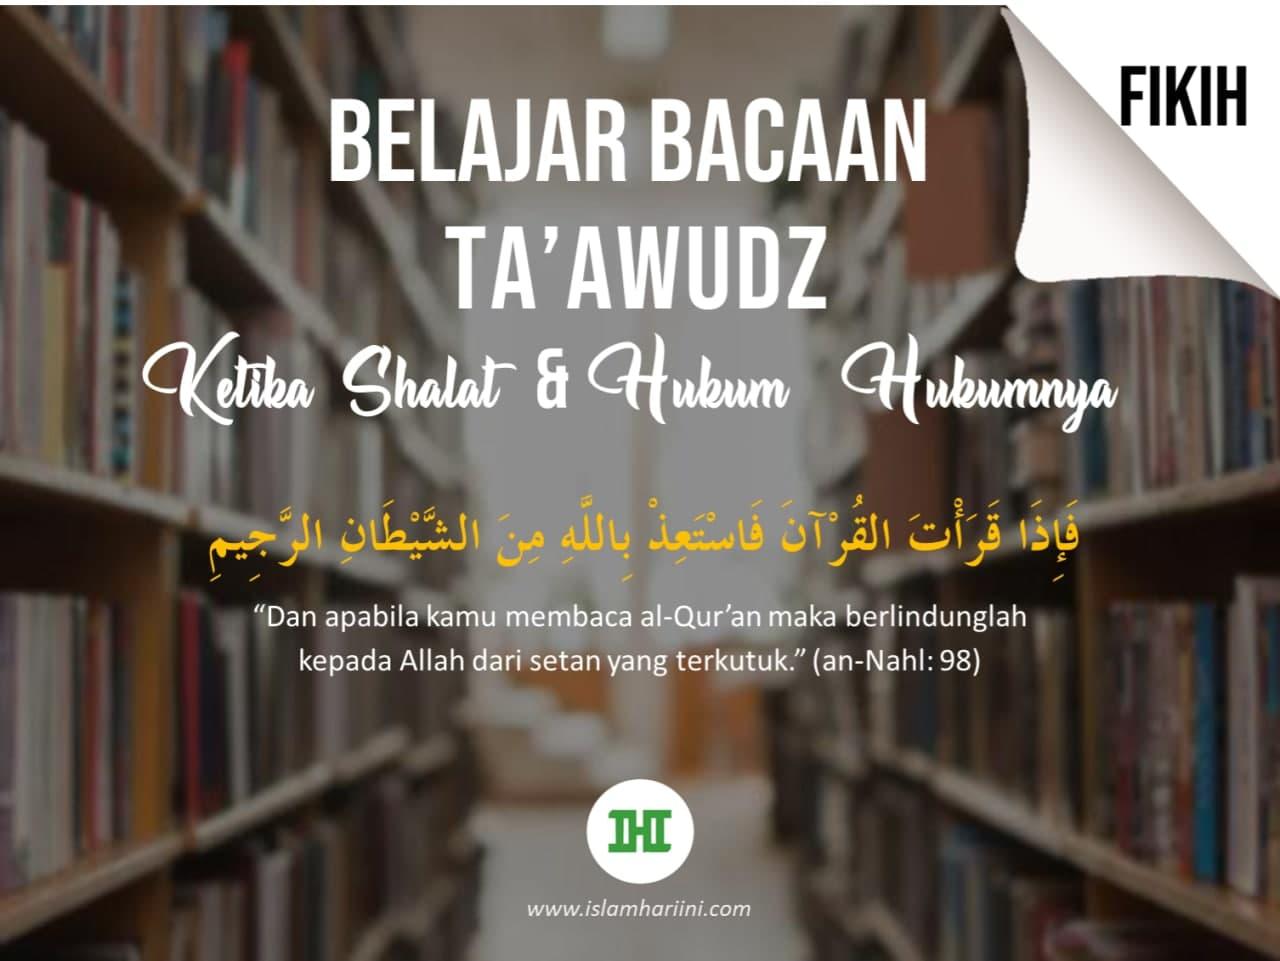 Belajar Bacaan Ta'awudz Ketika Shalat dan Hukum-hukumnya